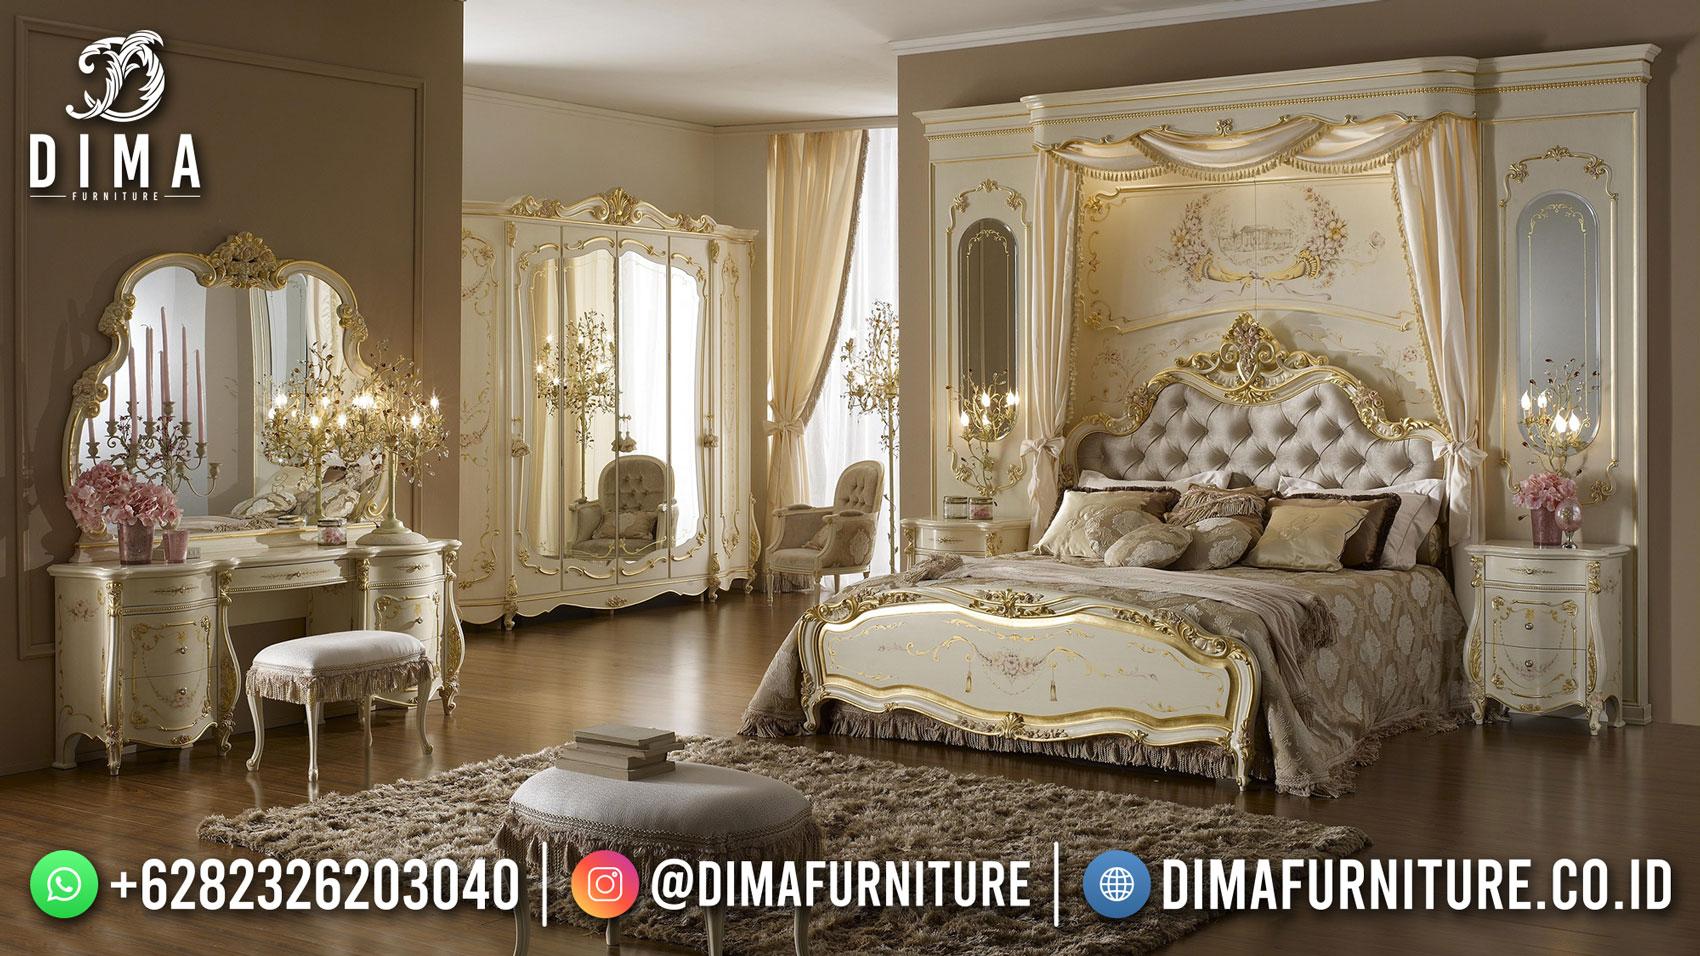 Buy Now Tempat Tidur Mewah Ukir Jepara Luxury Classic DF-1589